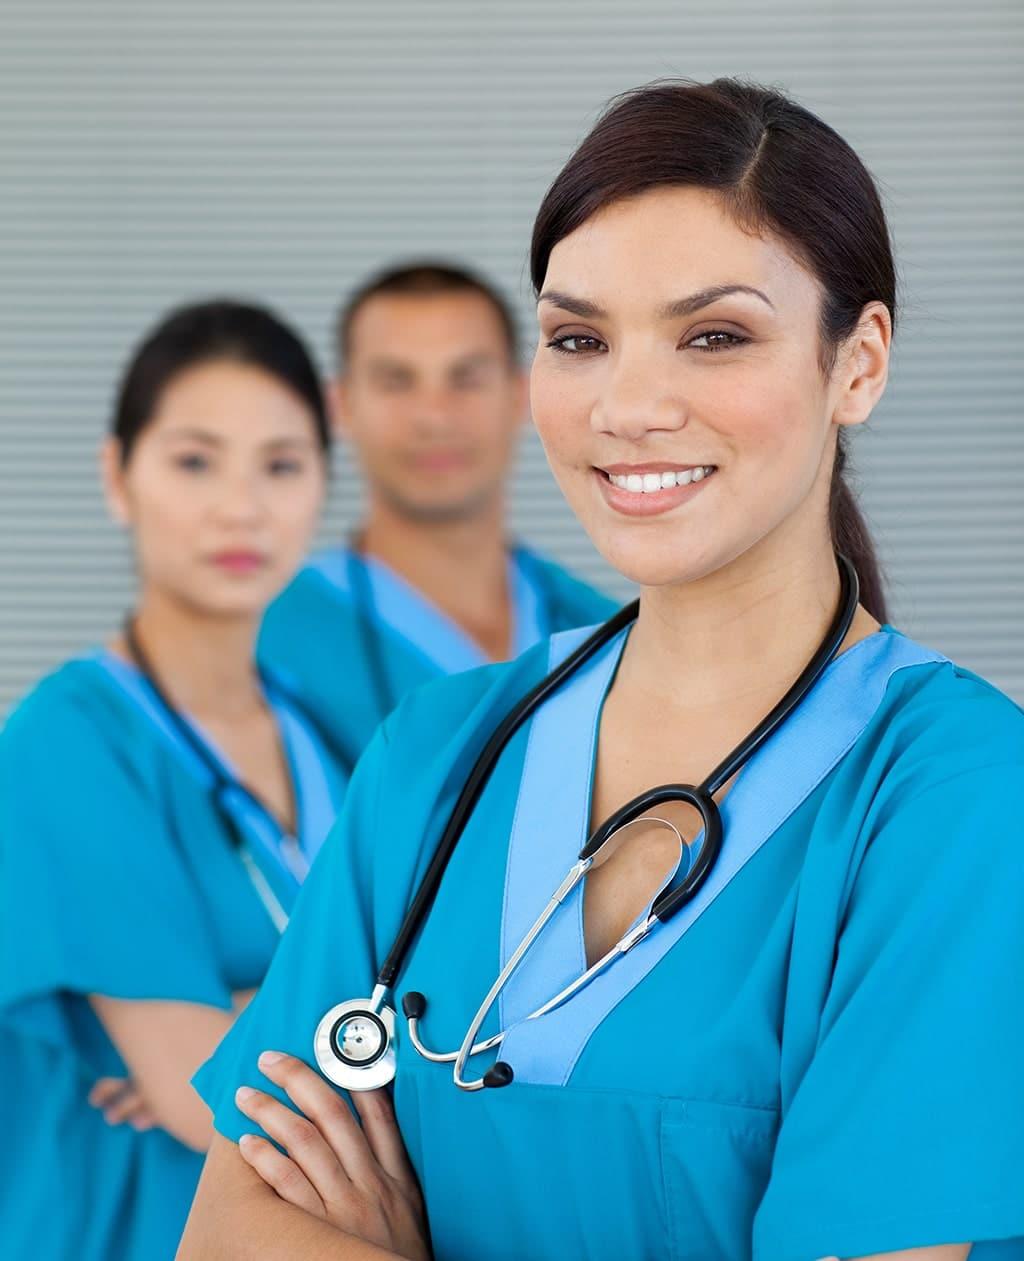 About Us Female Nurse Attractive-min